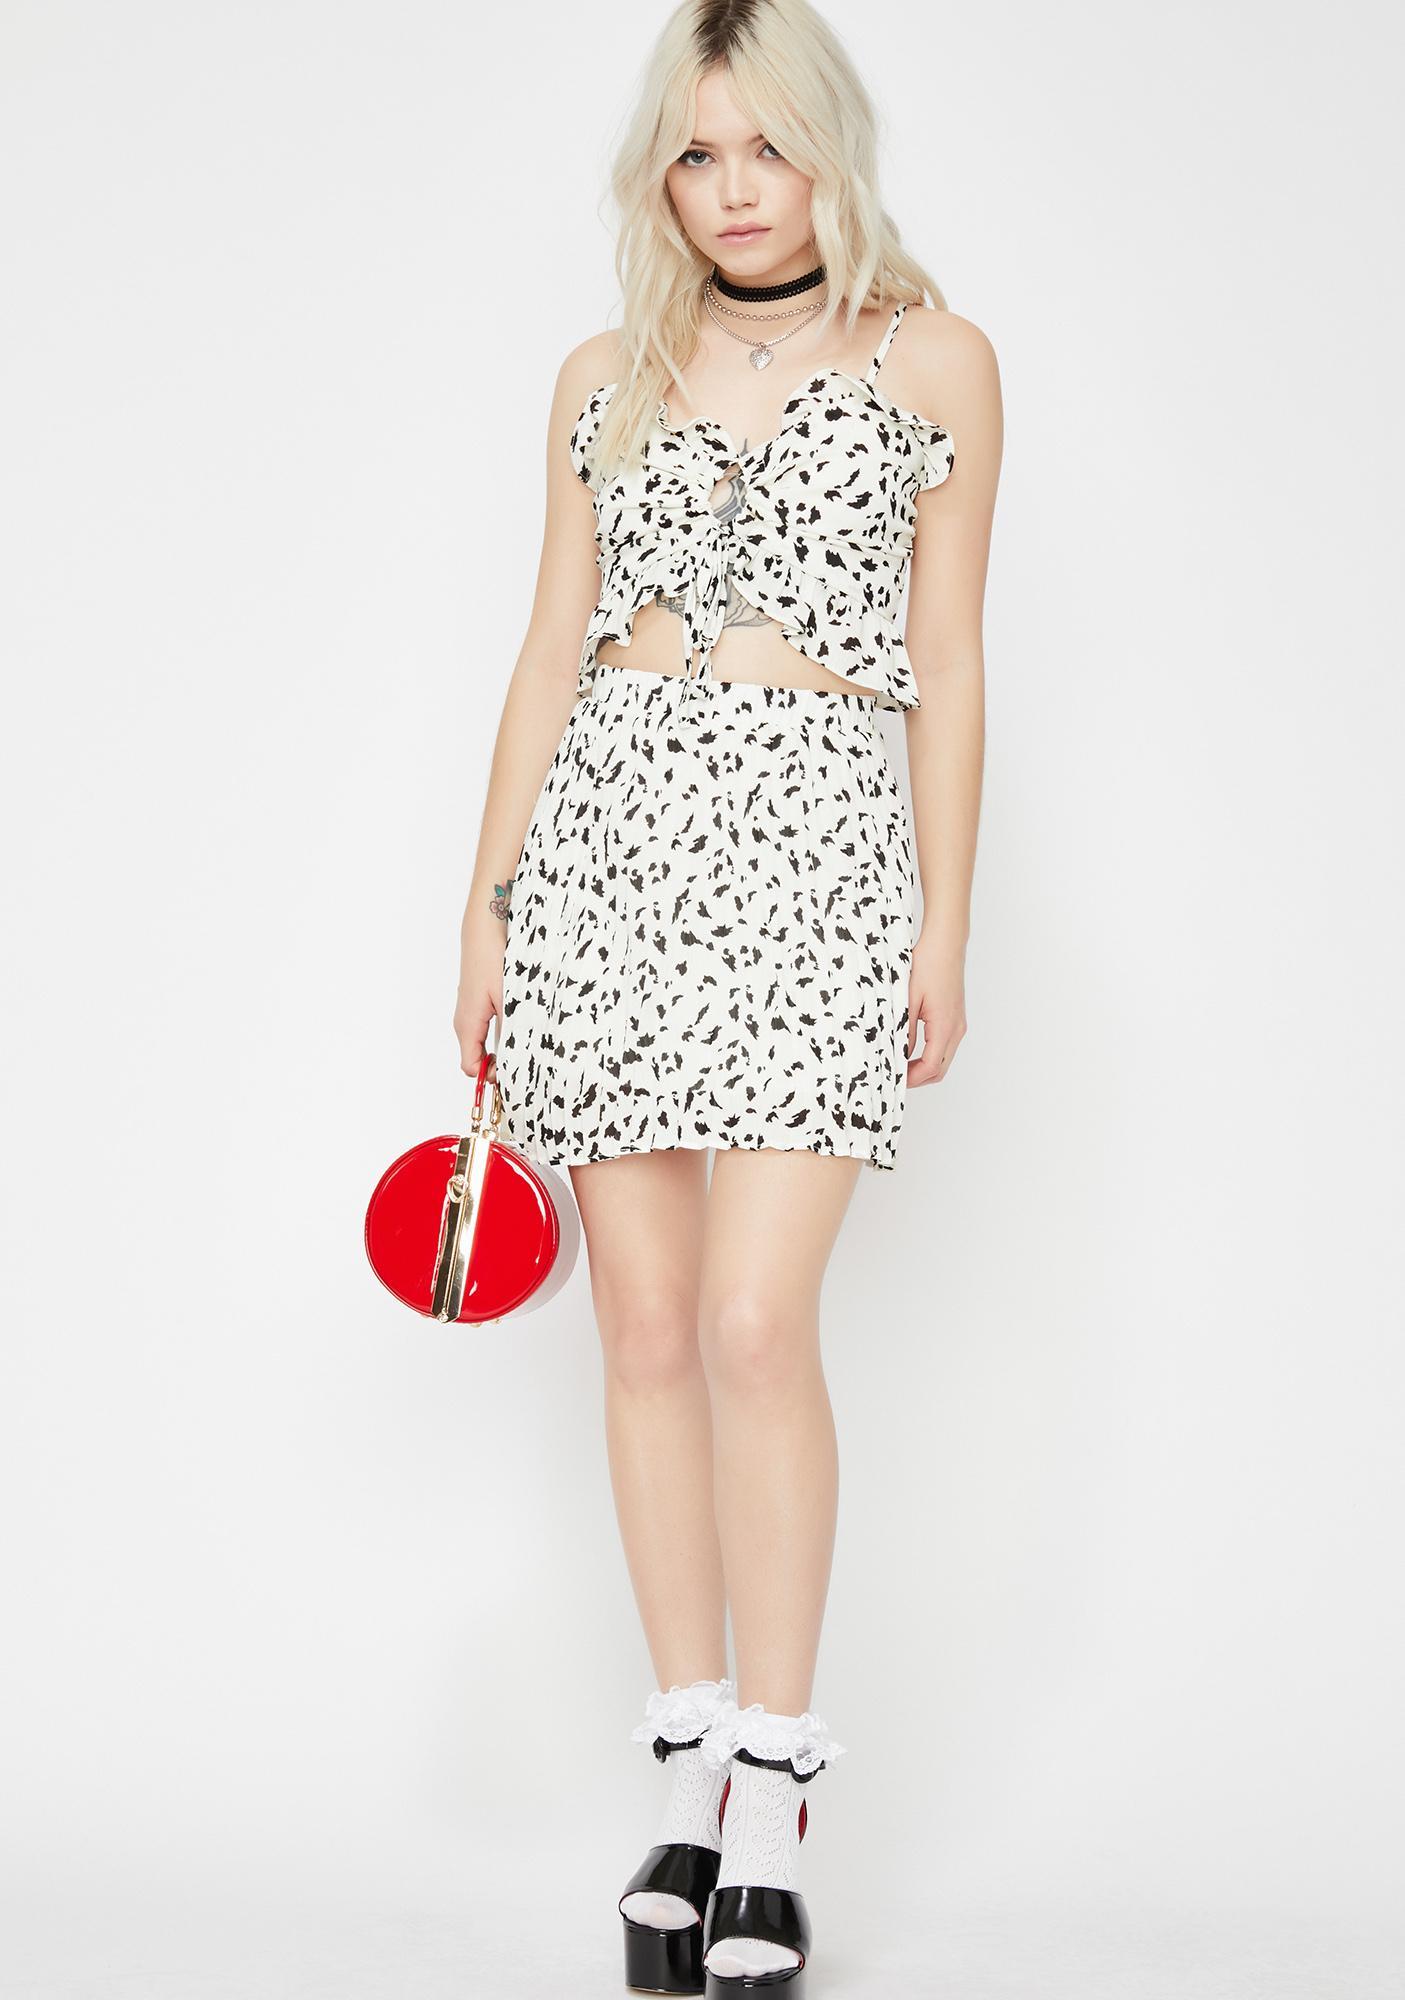 Posh Perfecto Pleated Skirt